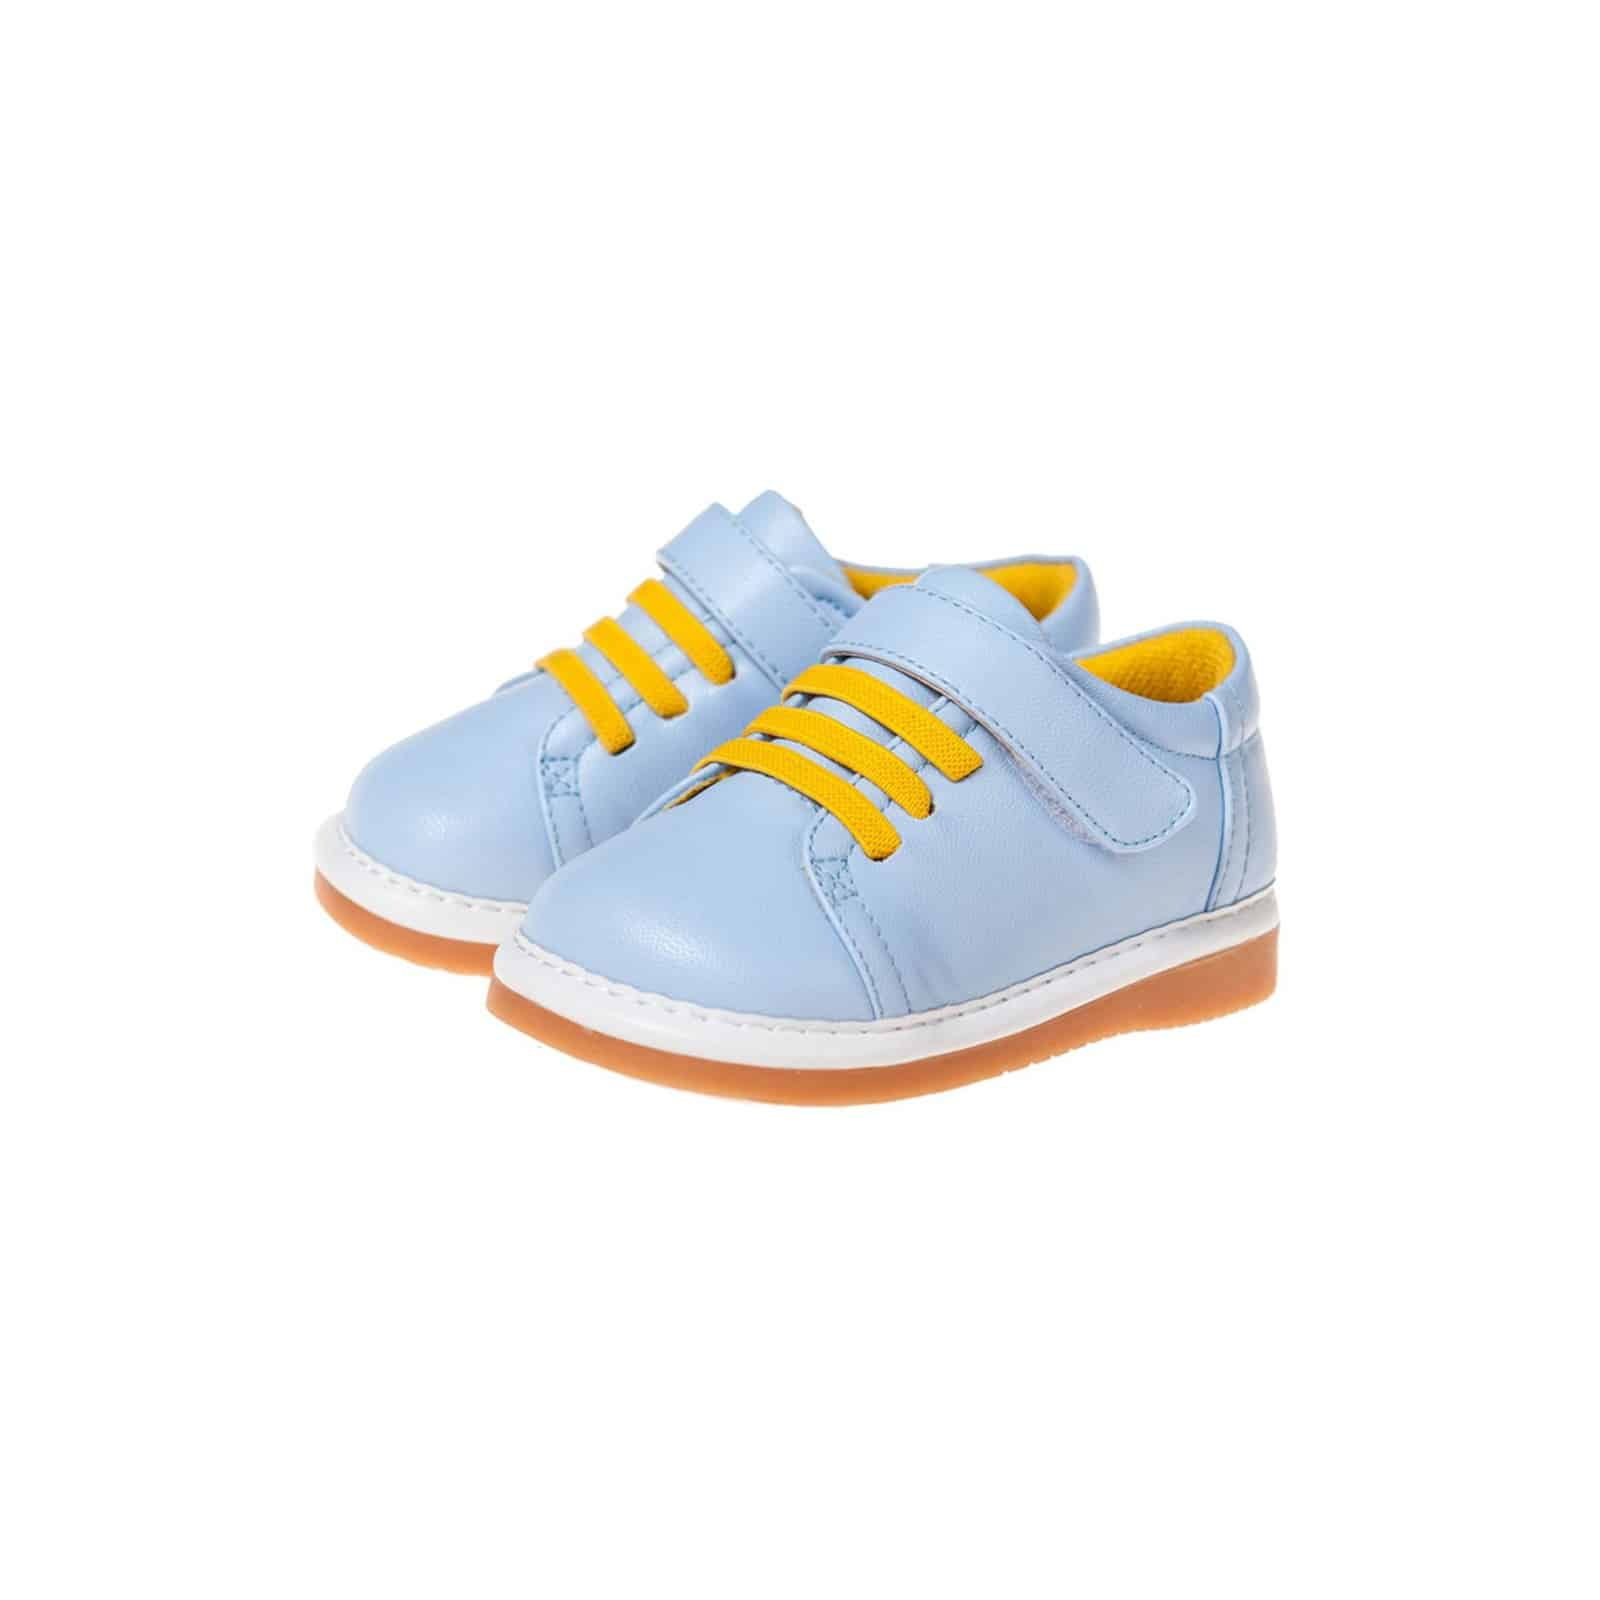 Little Blue Lamb - Zapatos de cordones de material sintético para niño, color gris, talla 21